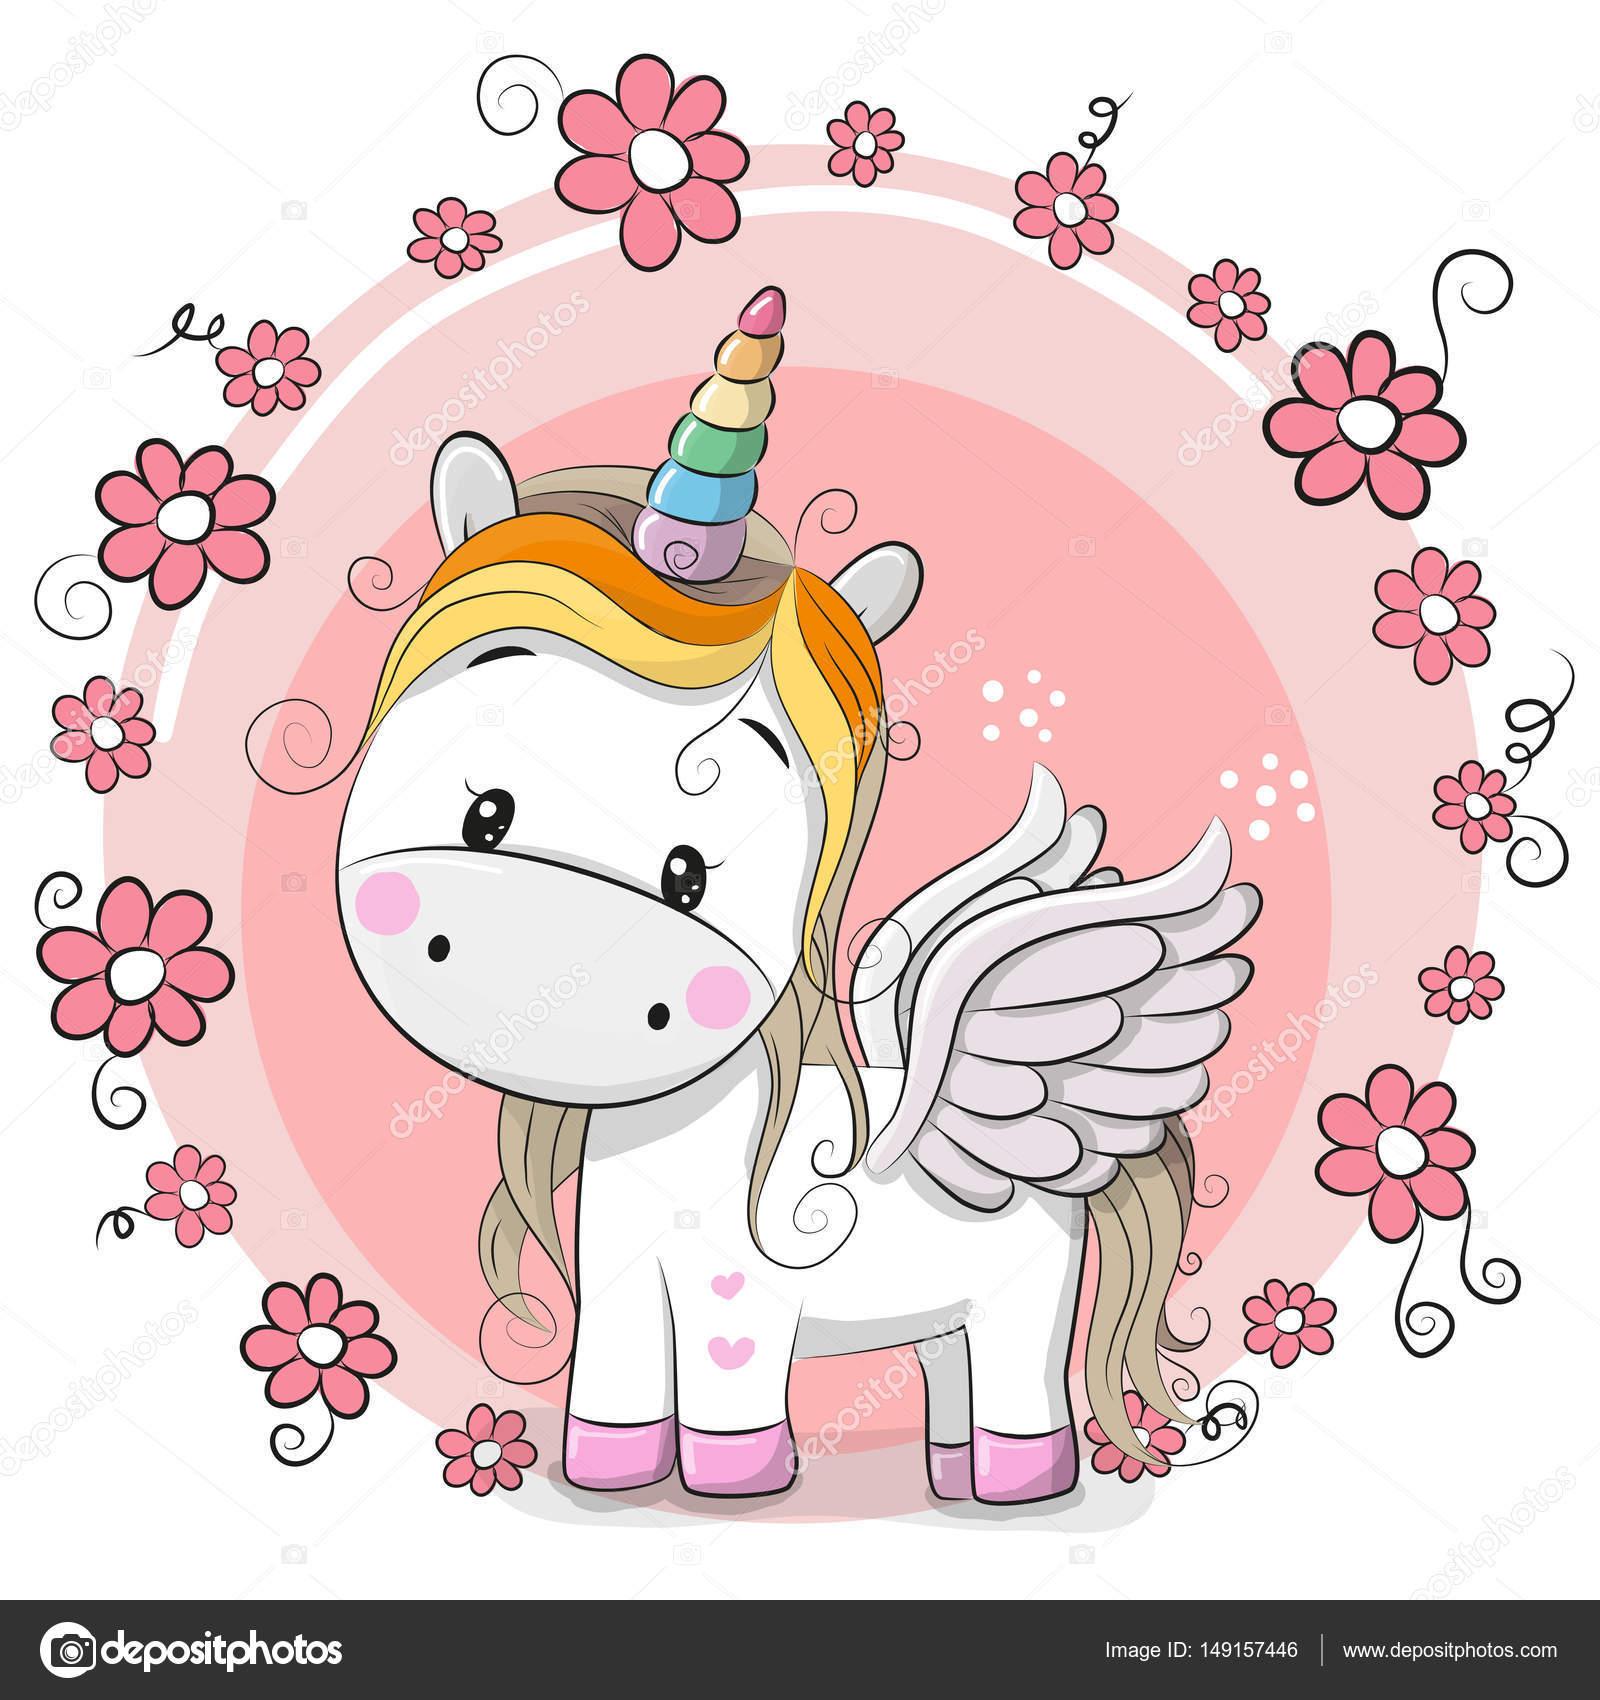 Stock Illustration Cute Cartoon Unicorn